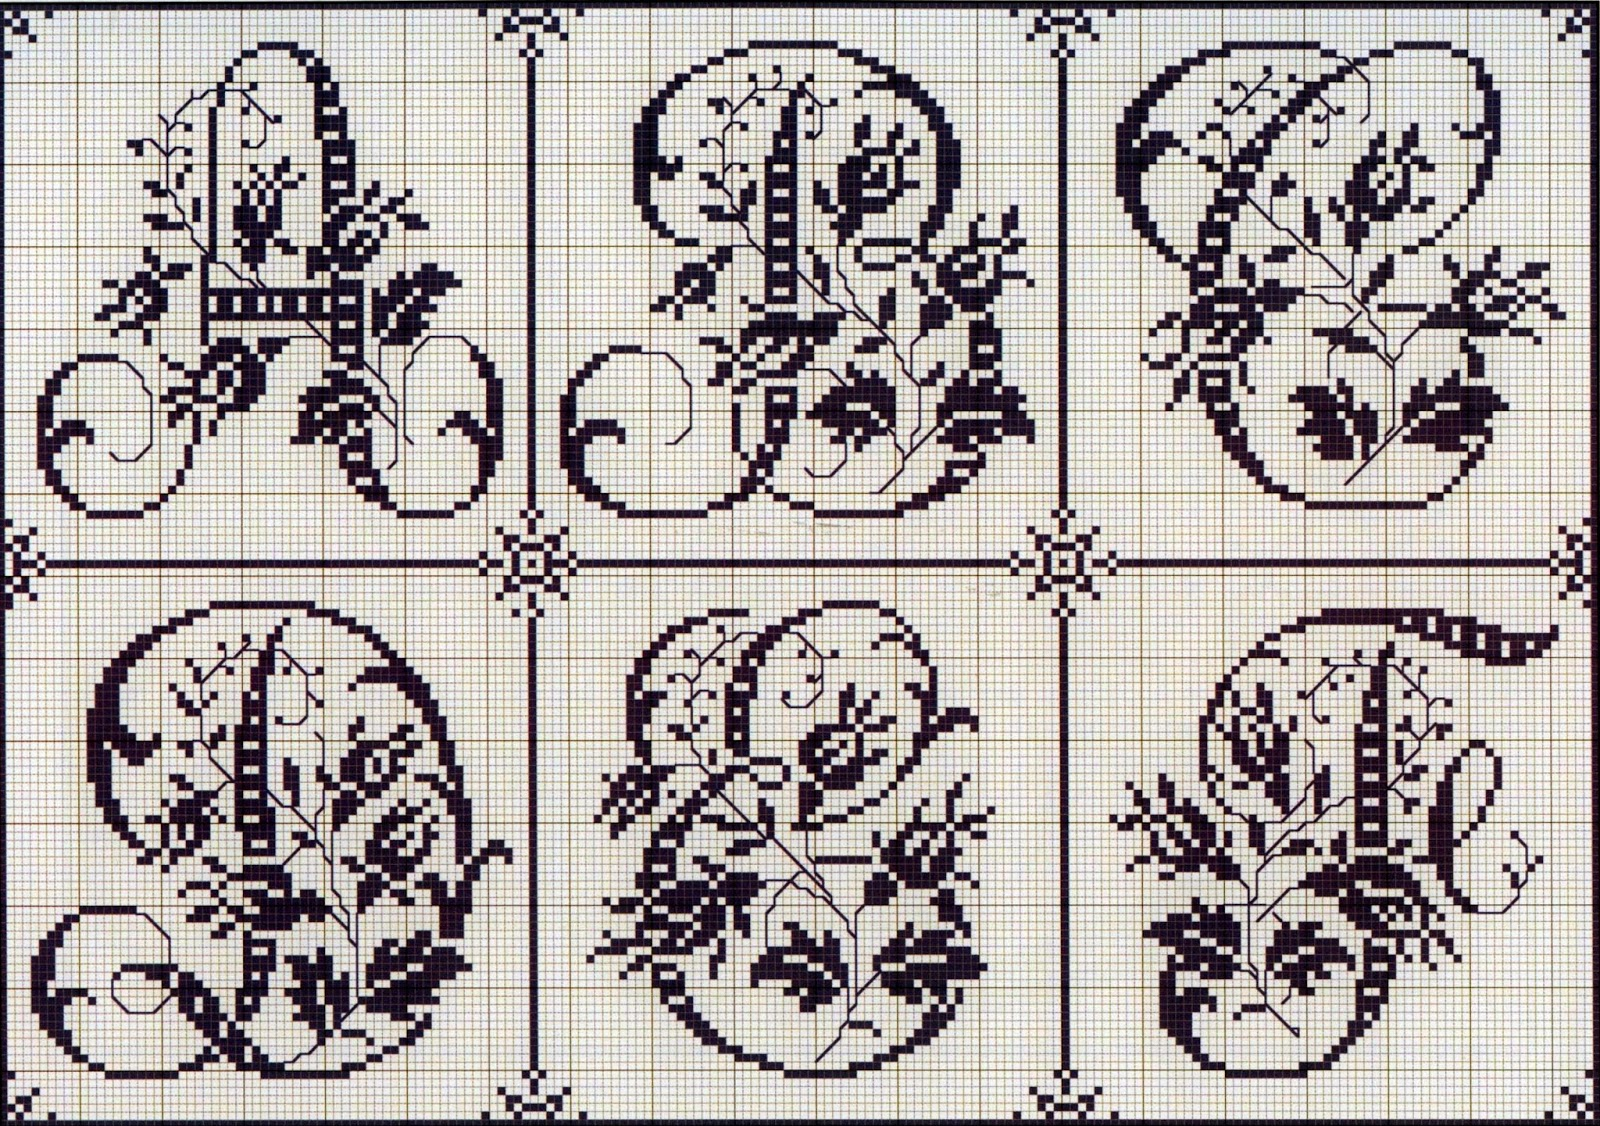 вышивка крестом монограмма схема